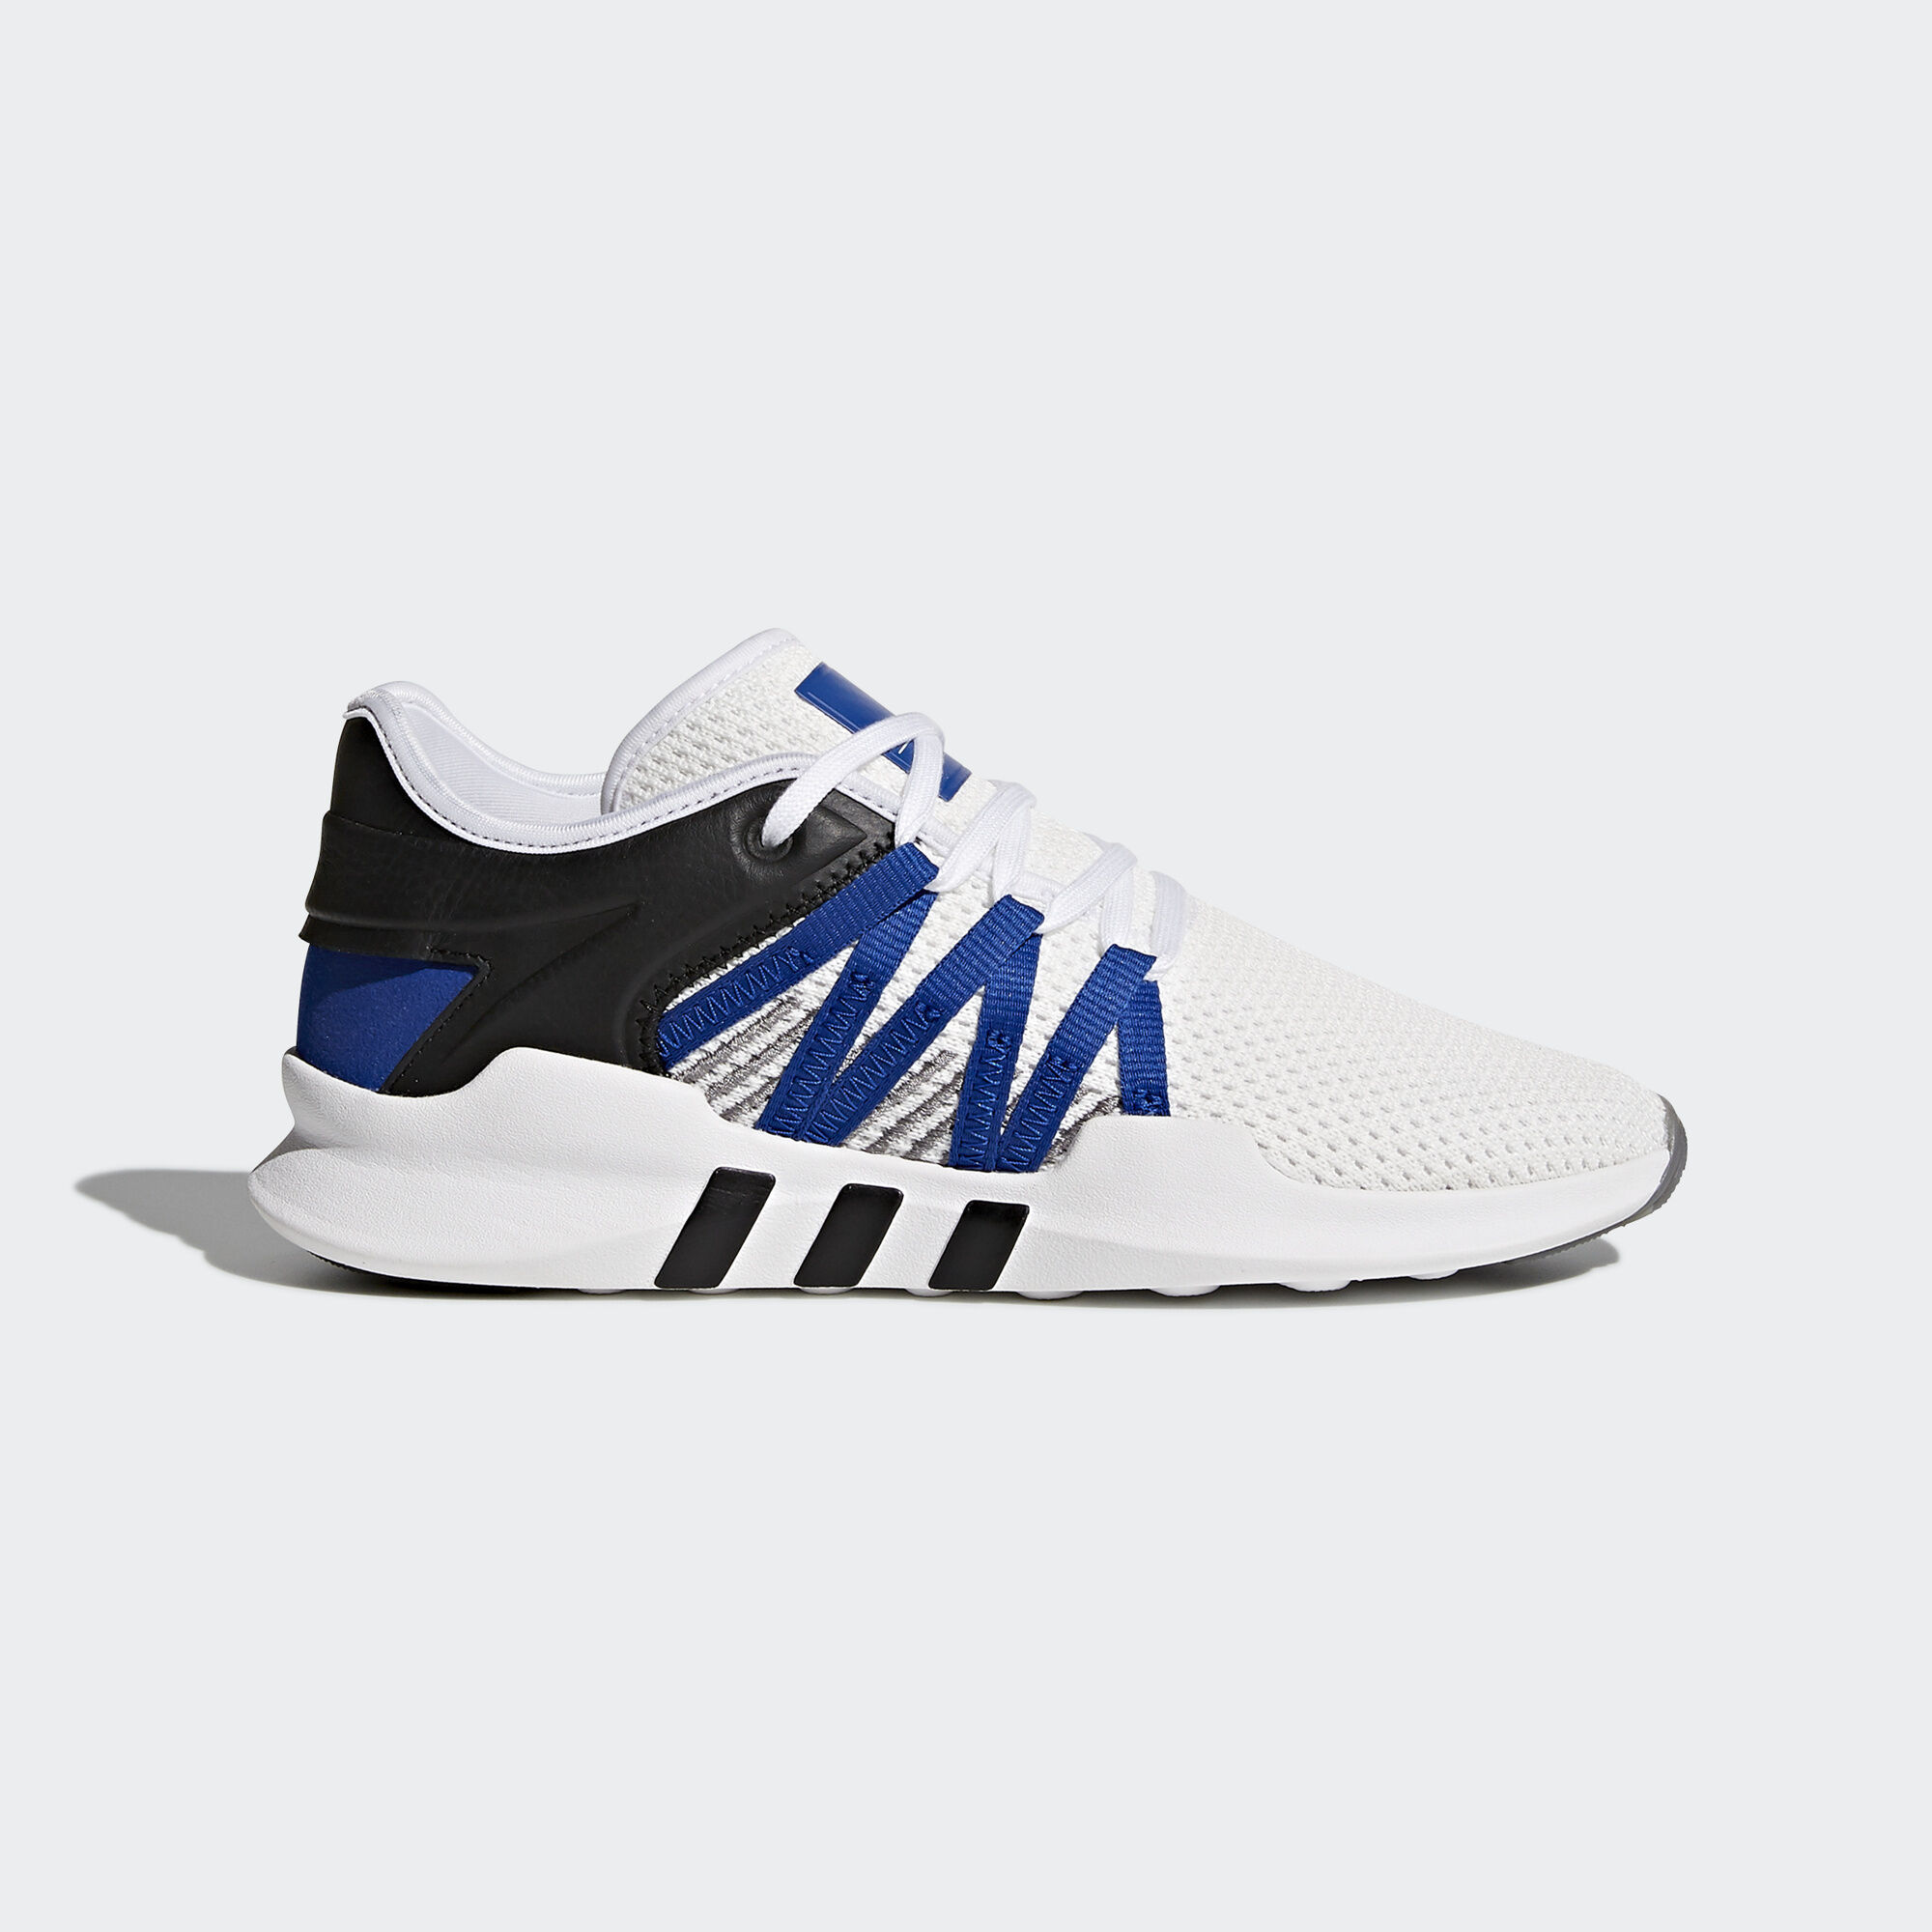 Adidas eqt avanzata racing scarpe bianco adidas regionali